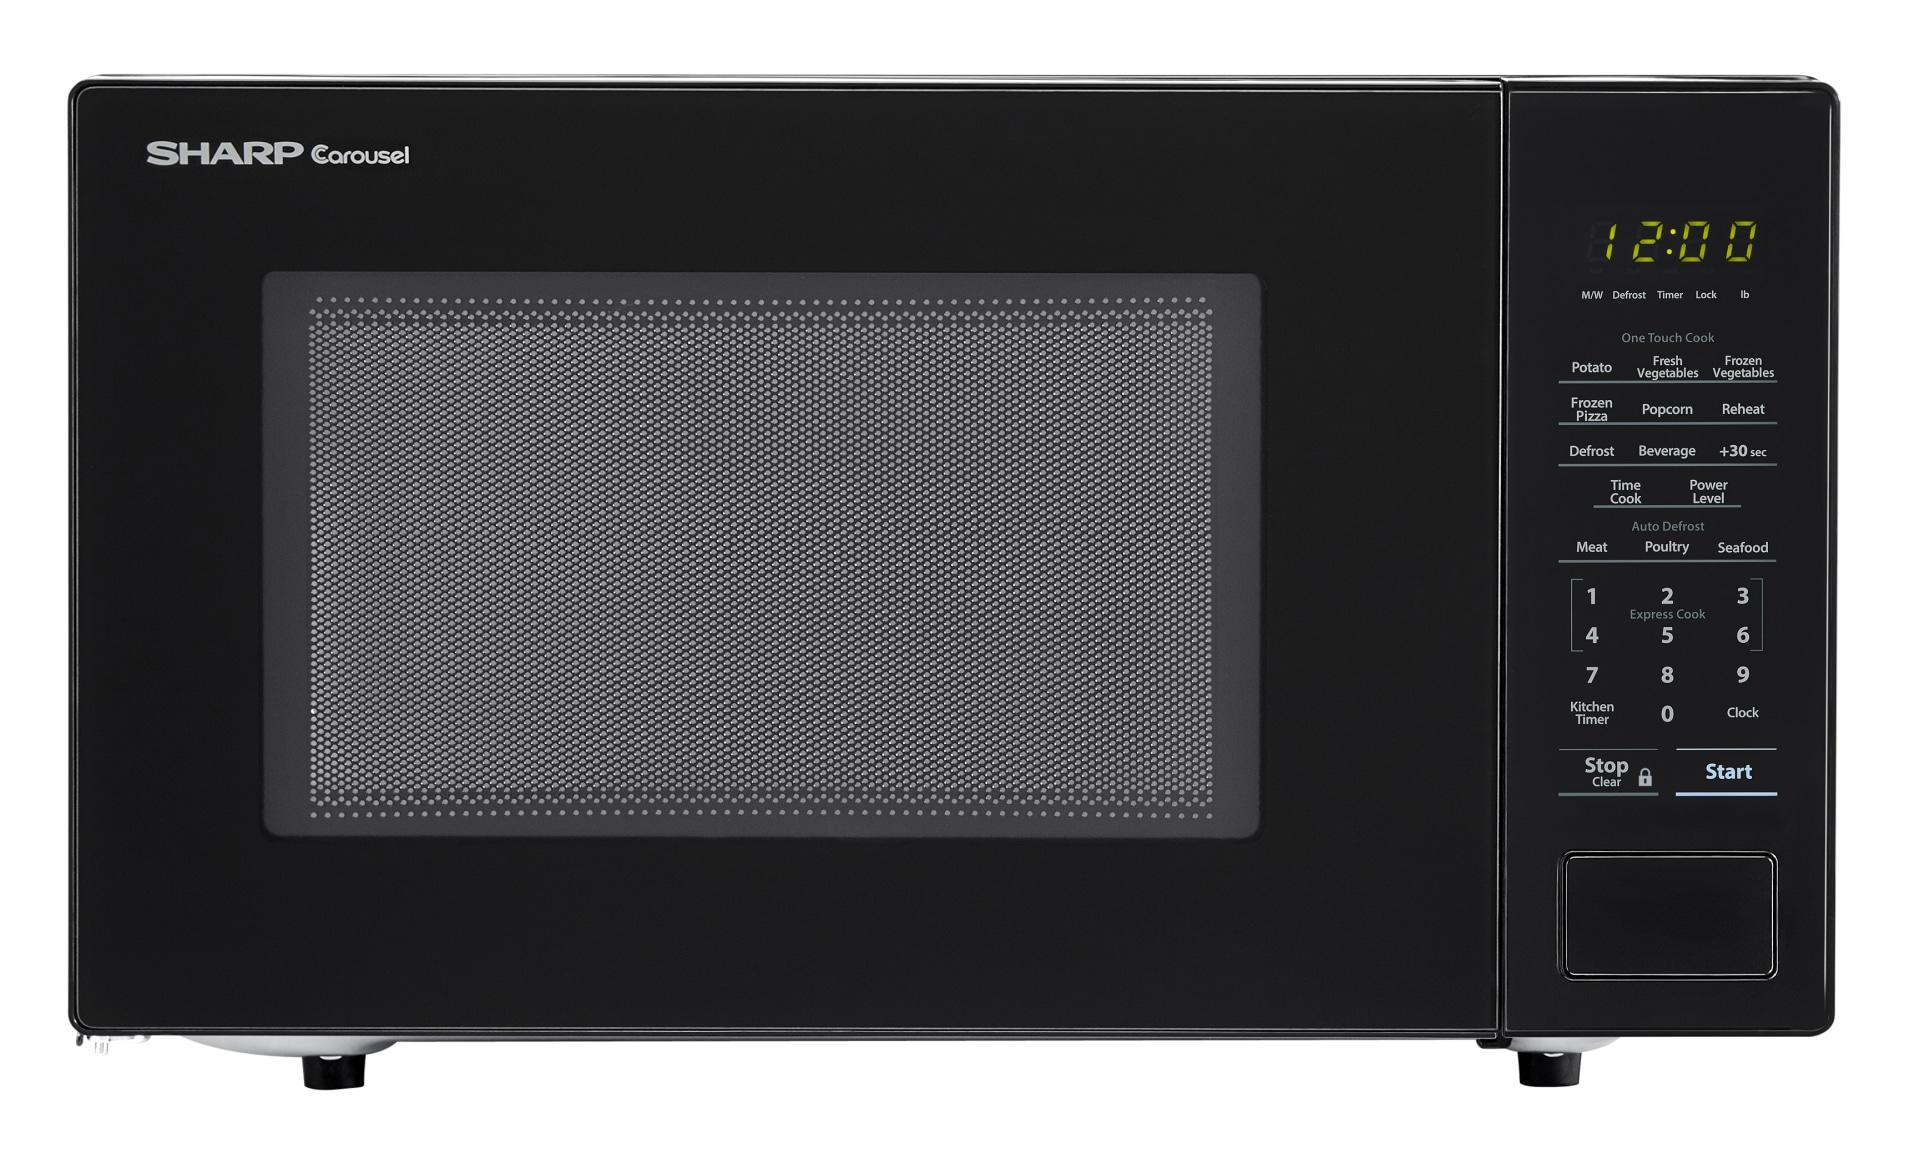 sharp carousel 1 1 cu ft 1000 watt countertop microwave black